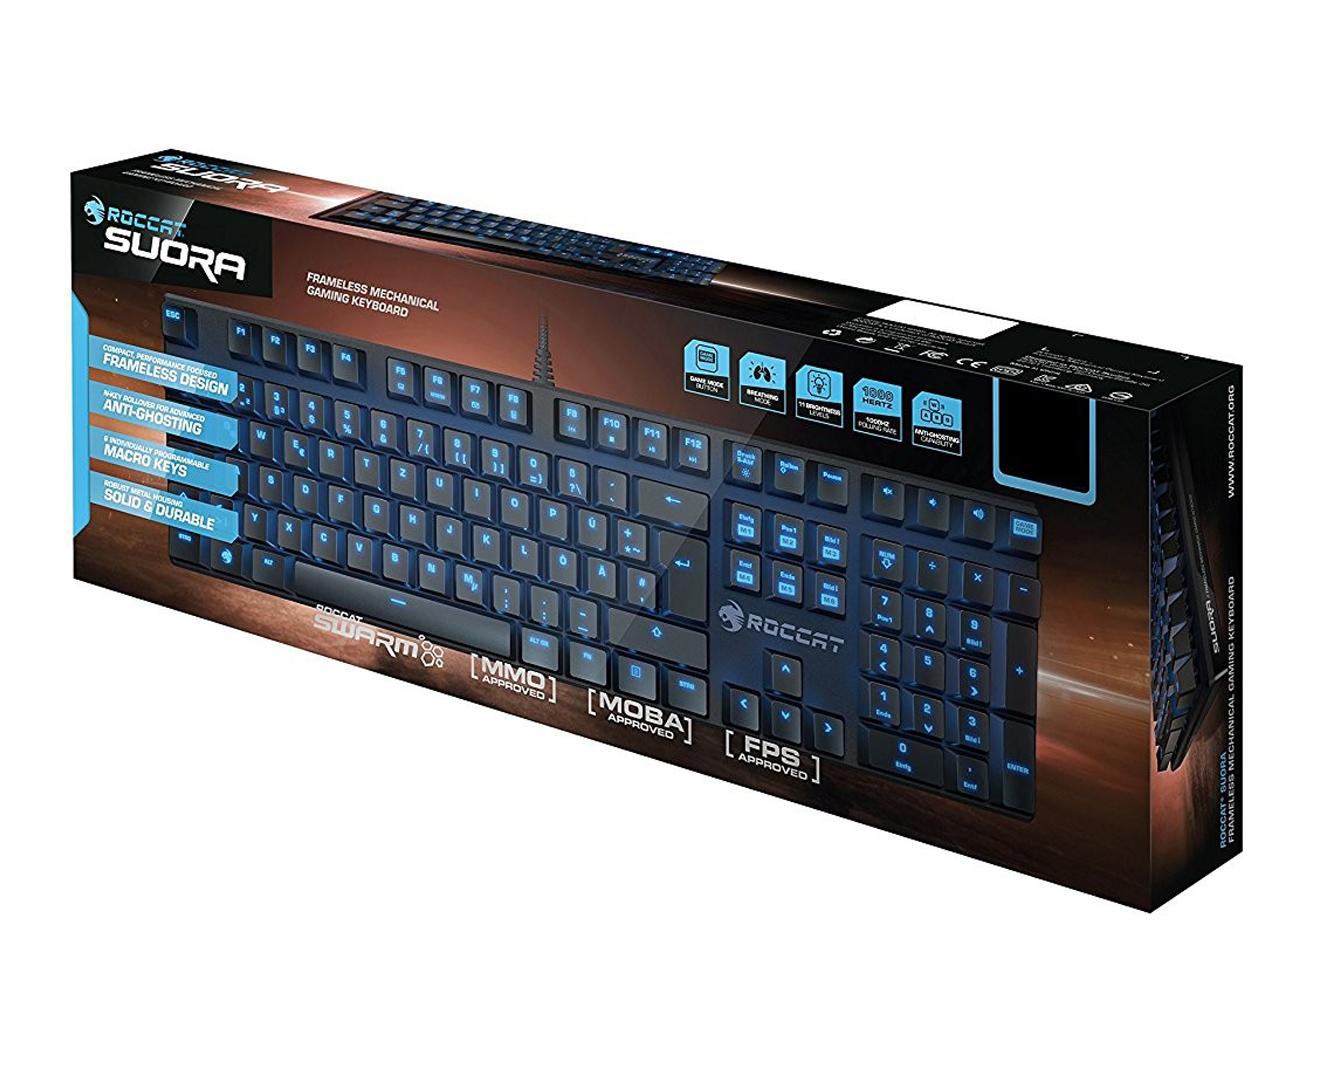 a71d34acae6 Roccat Suora Frameless Mechanical Gaming Keyboard - Black | Catch.com.au